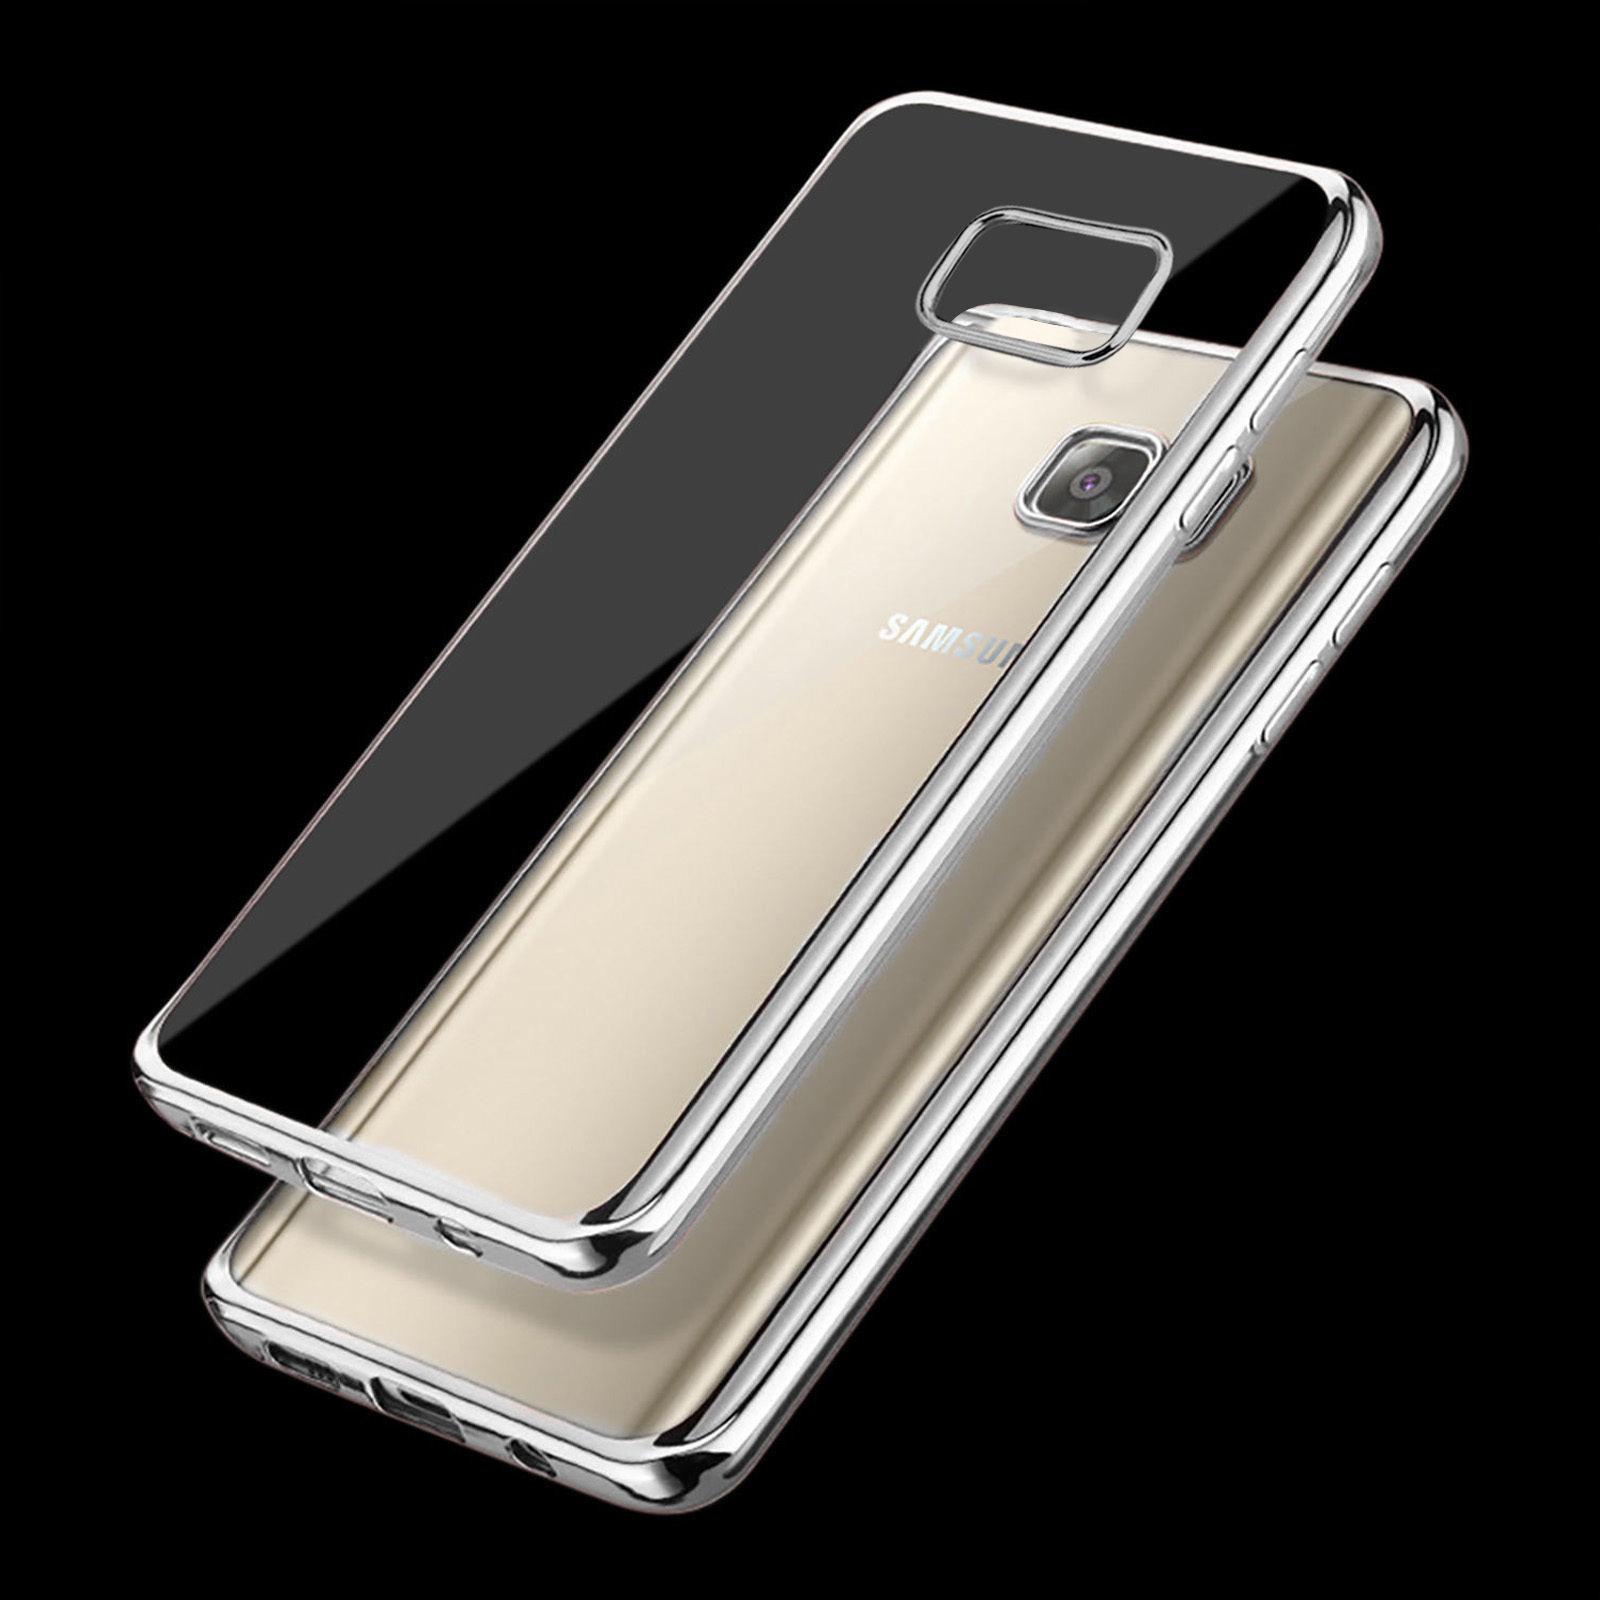 Ultra tenké gelové pouzdro s designovým rámečkem pro Samsung Galaxy S6 Edge+ (SVI G928F) - stř